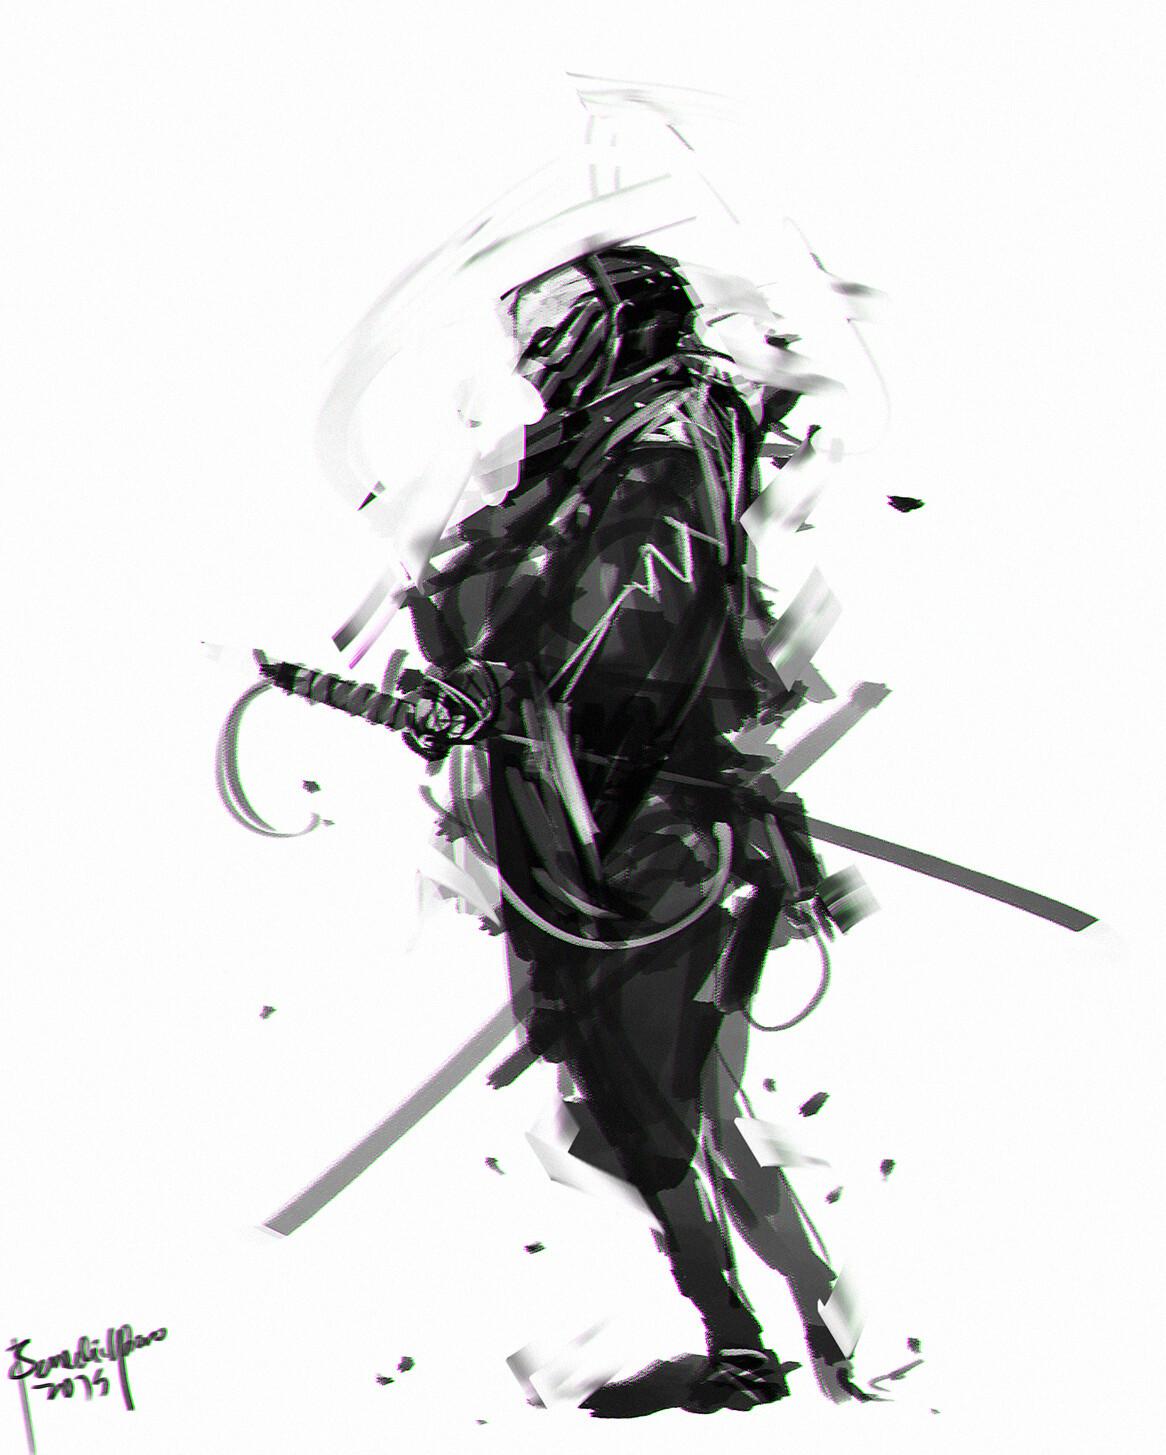 Benedick bana samurai new lores